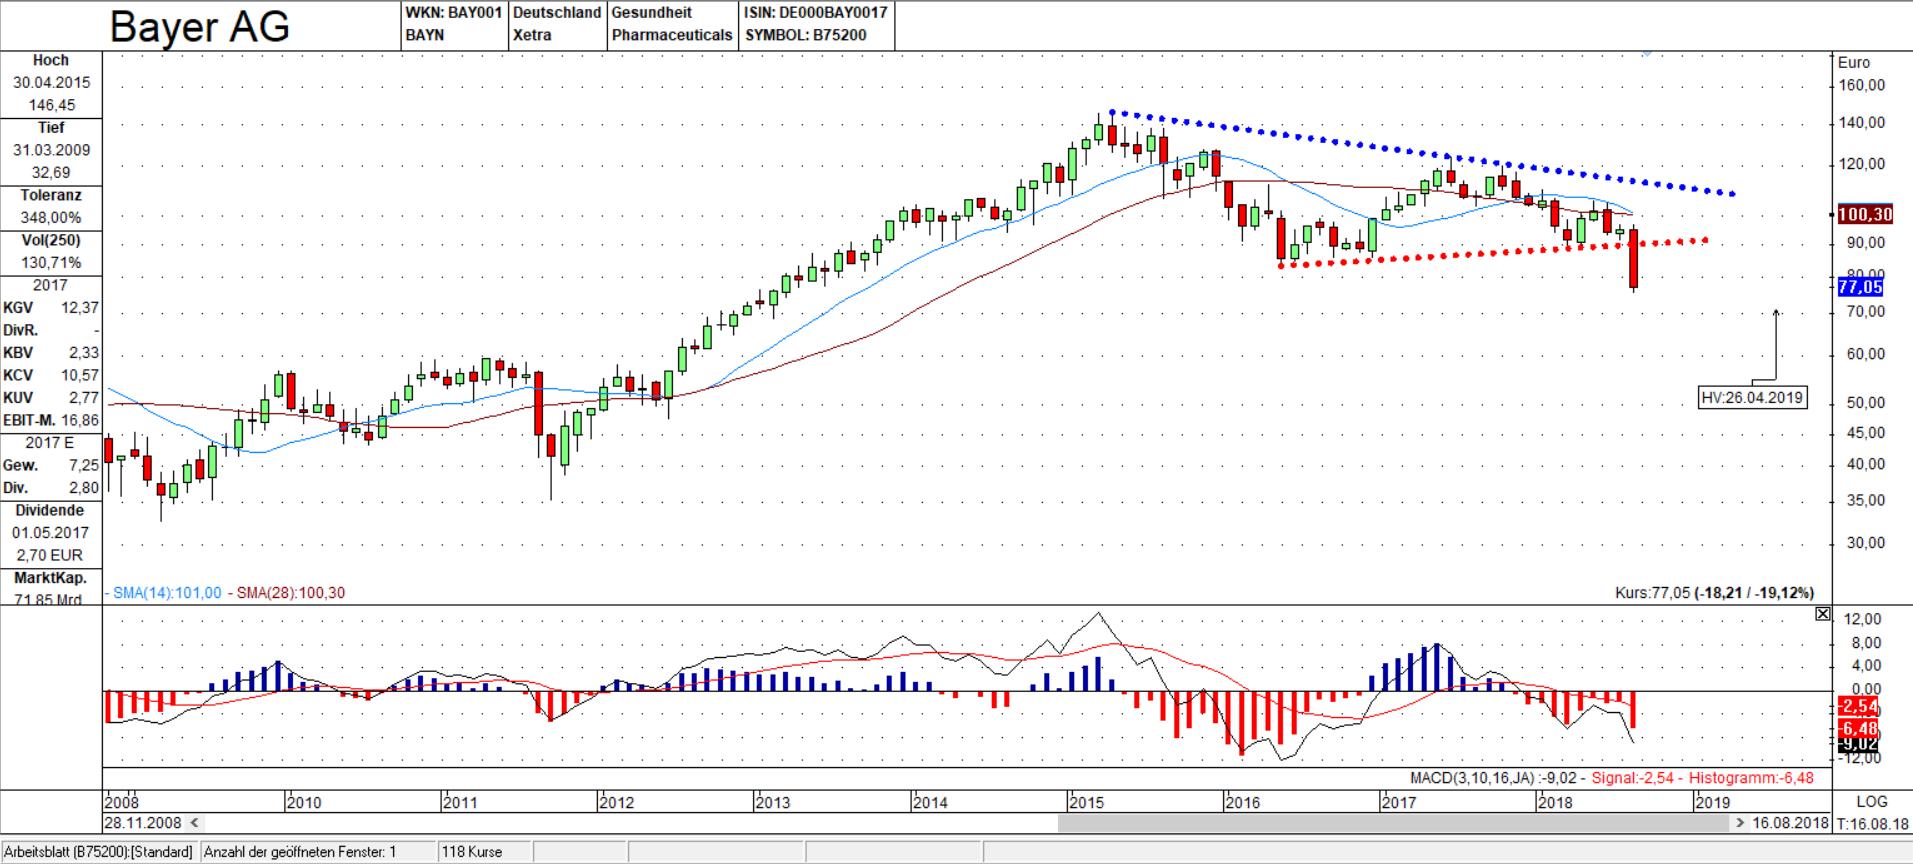 BAYN Chart: Ausbruch aus dem Dreieck